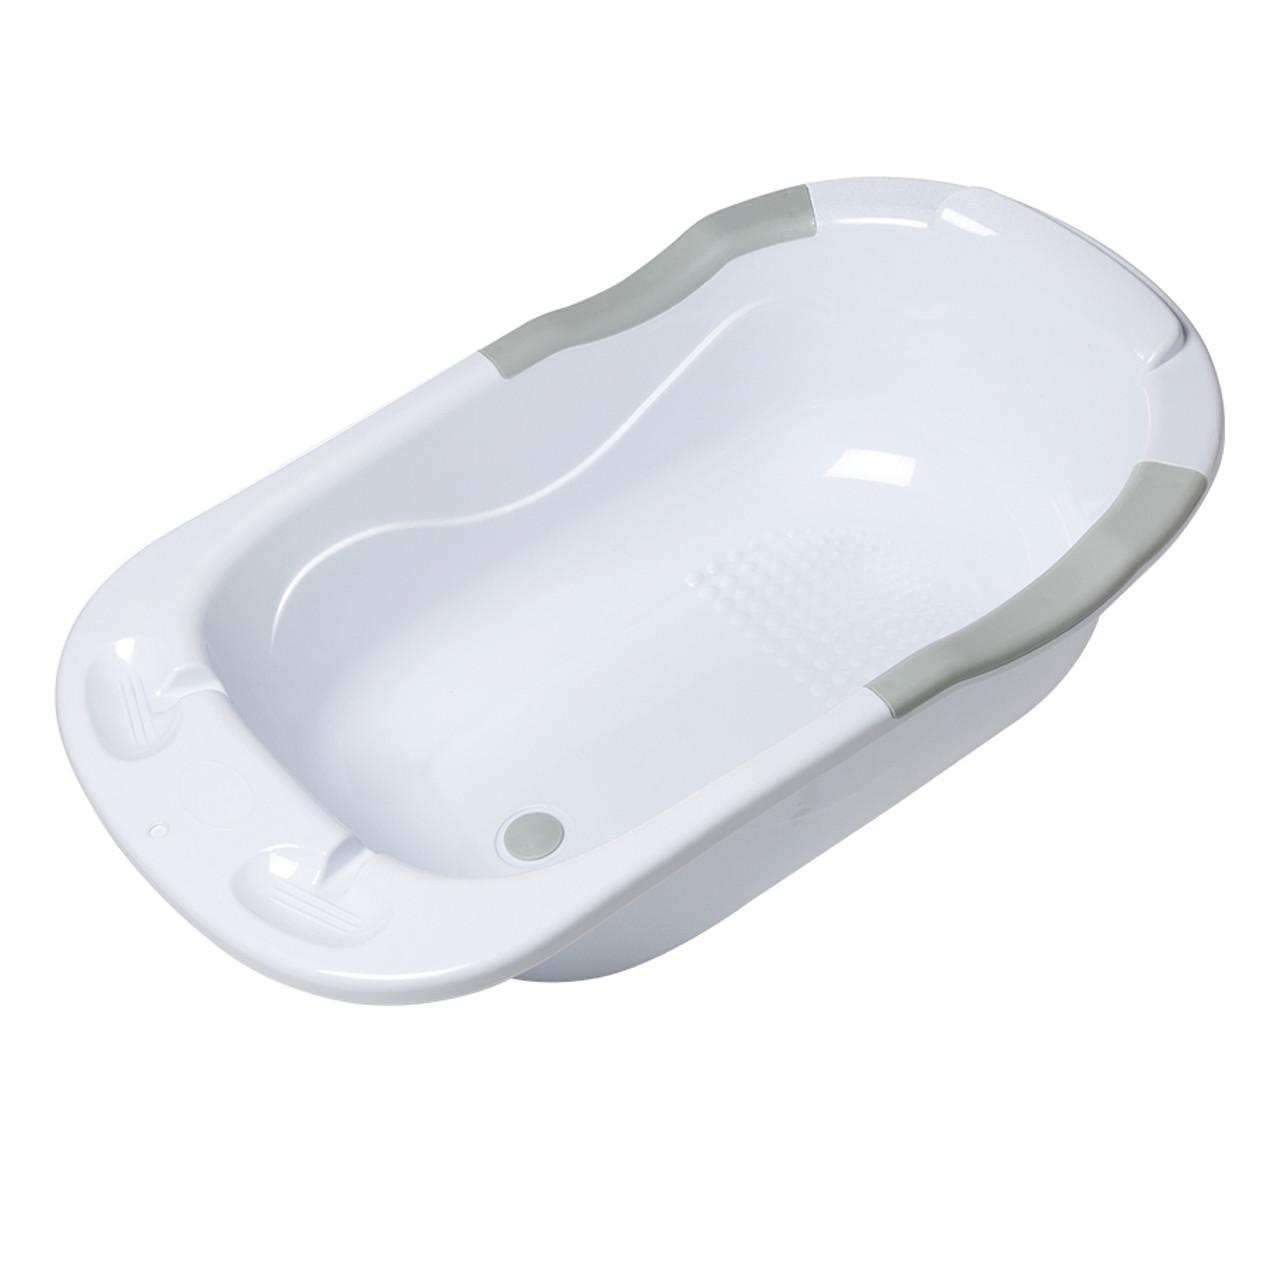 Image result for big baby bath